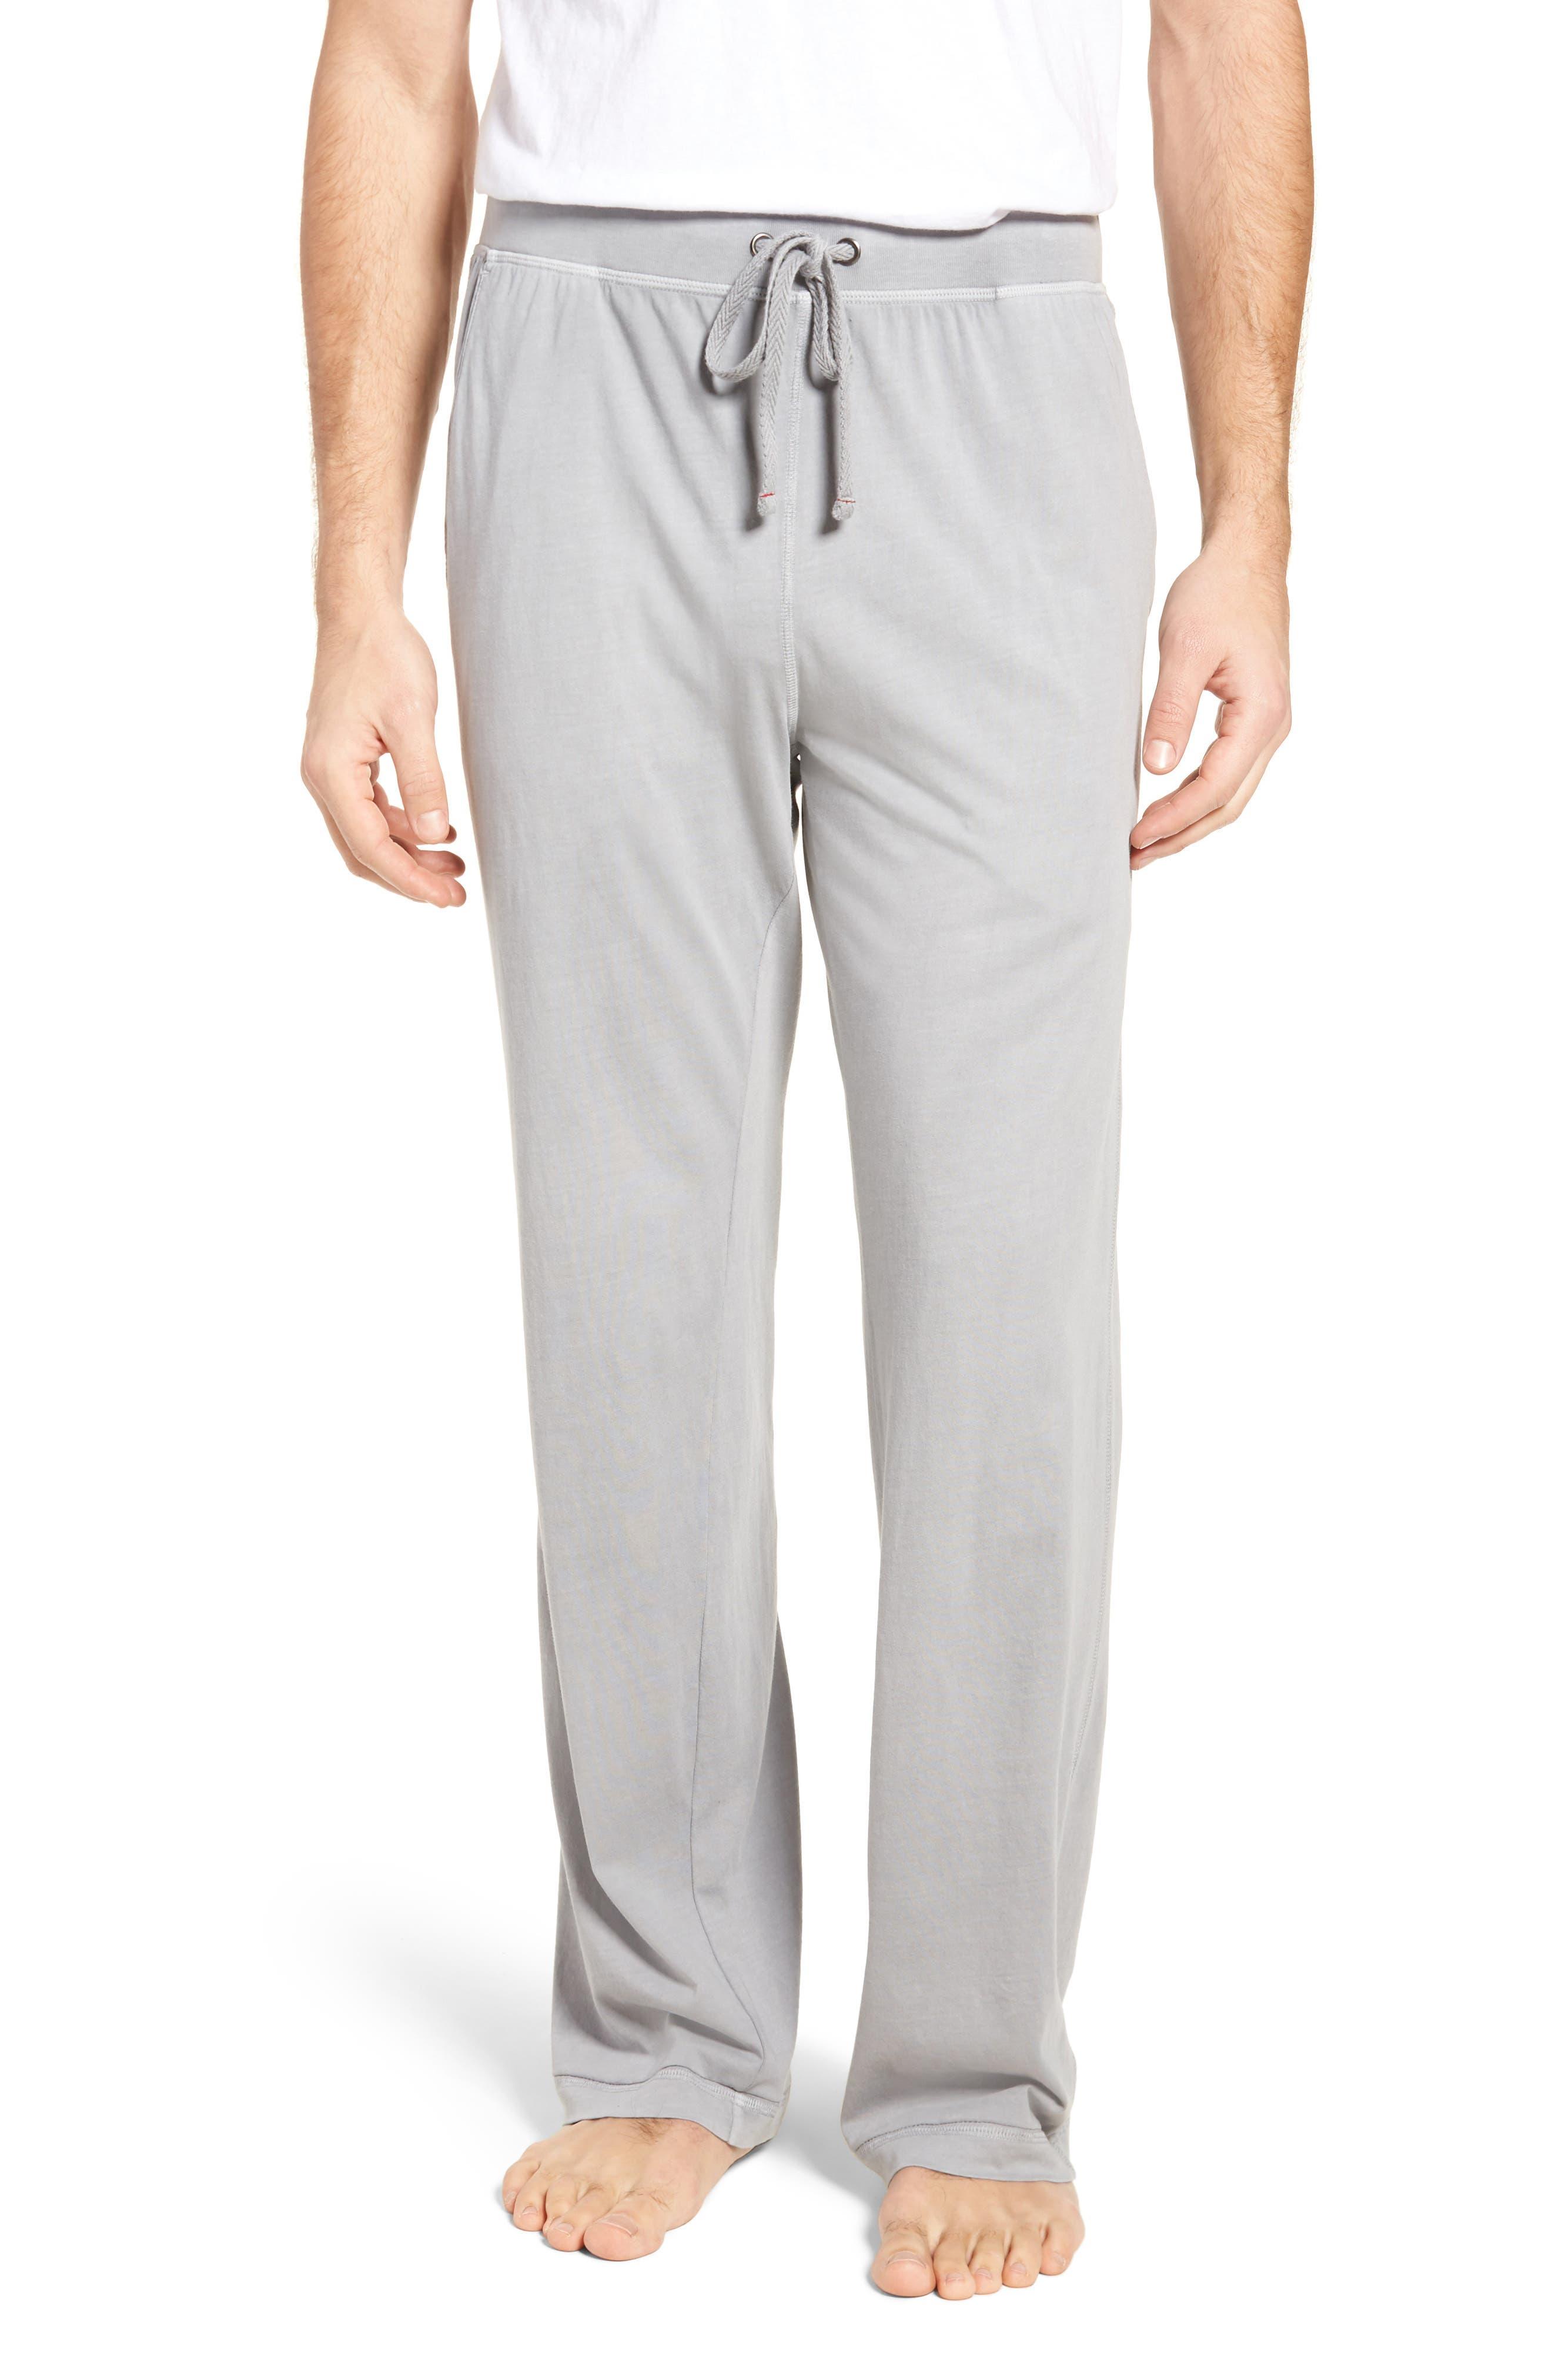 Peruvian Pima Cotton Lounge Pants,                             Main thumbnail 1, color,                             Grey